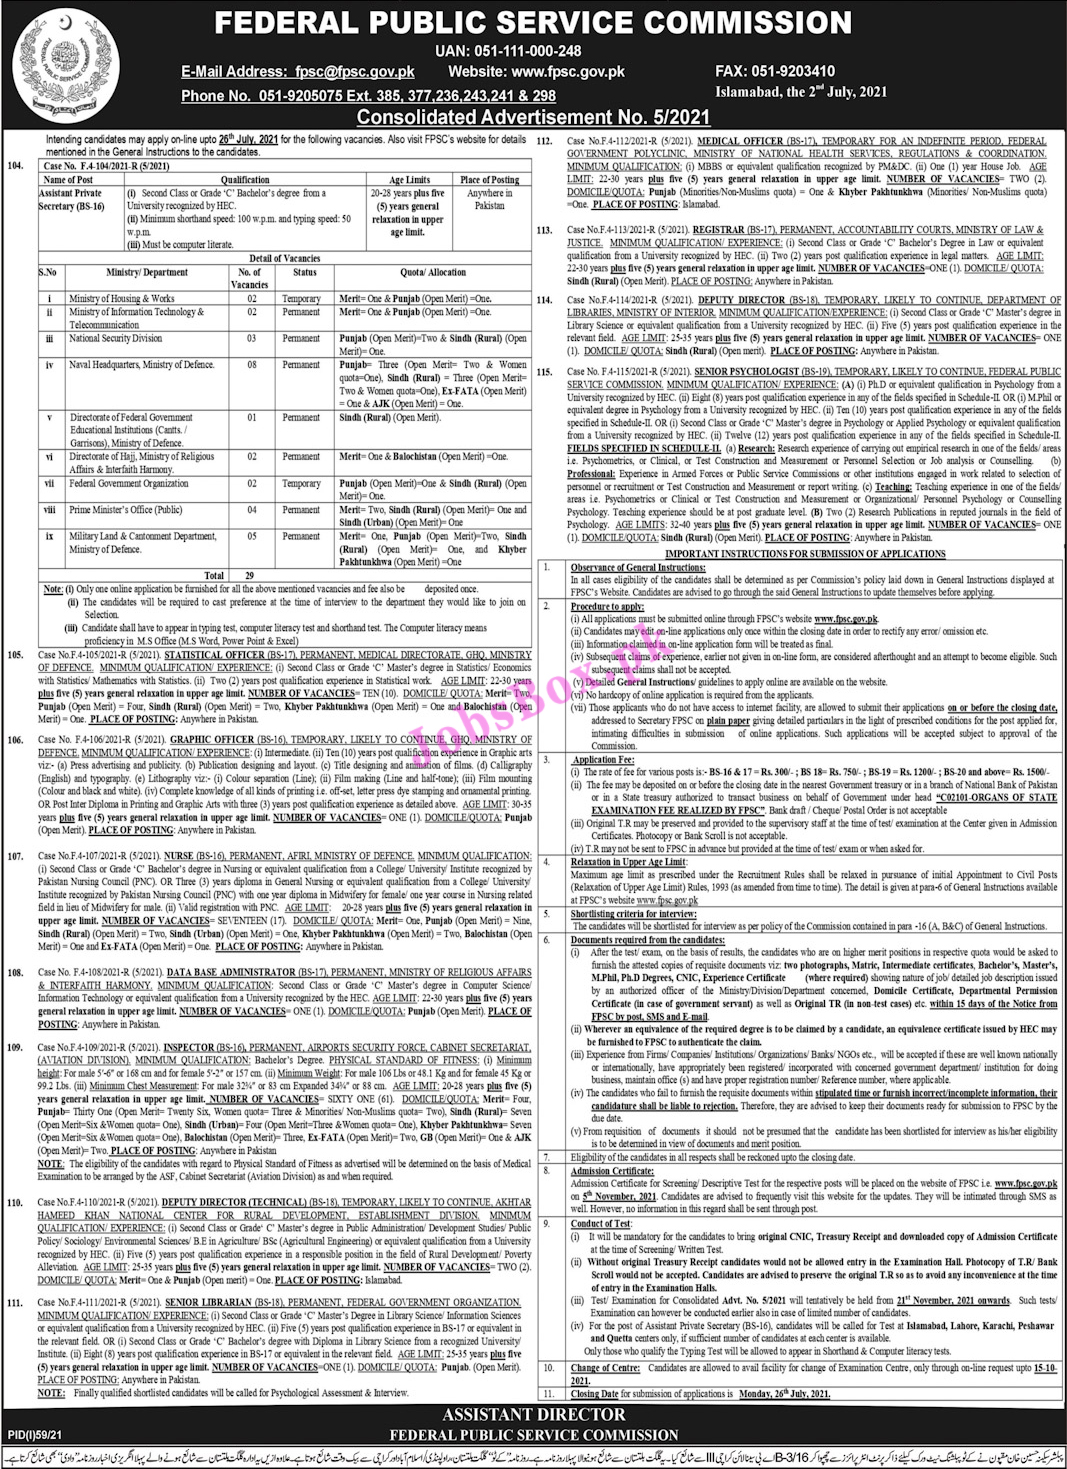 FPSC Jobs 2021 Latest Advertisement No. 5 – Apply via Online.fpsc.gov.pk